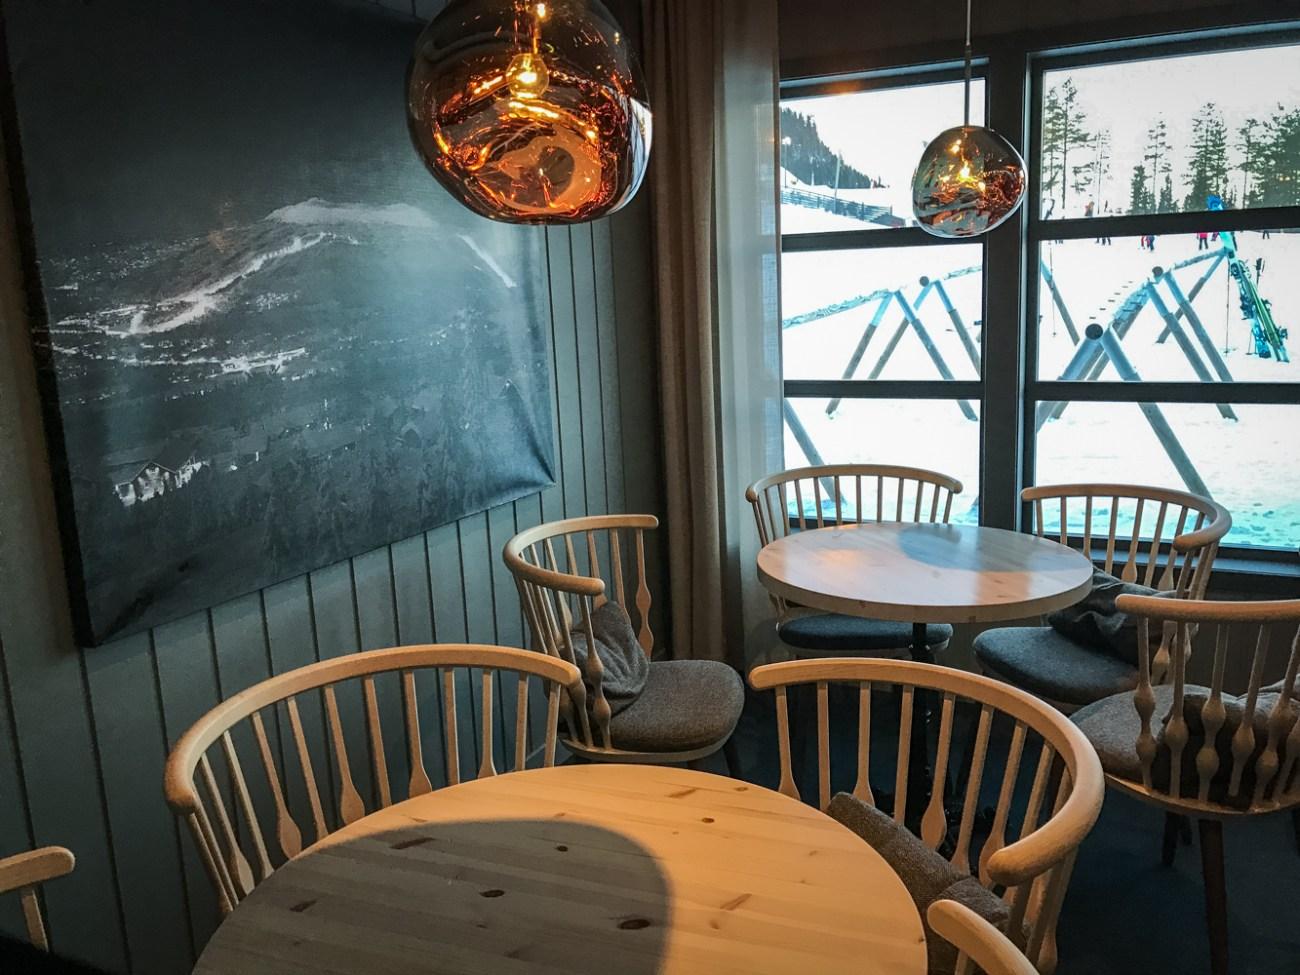 Sindrestua i Trysil, Norway